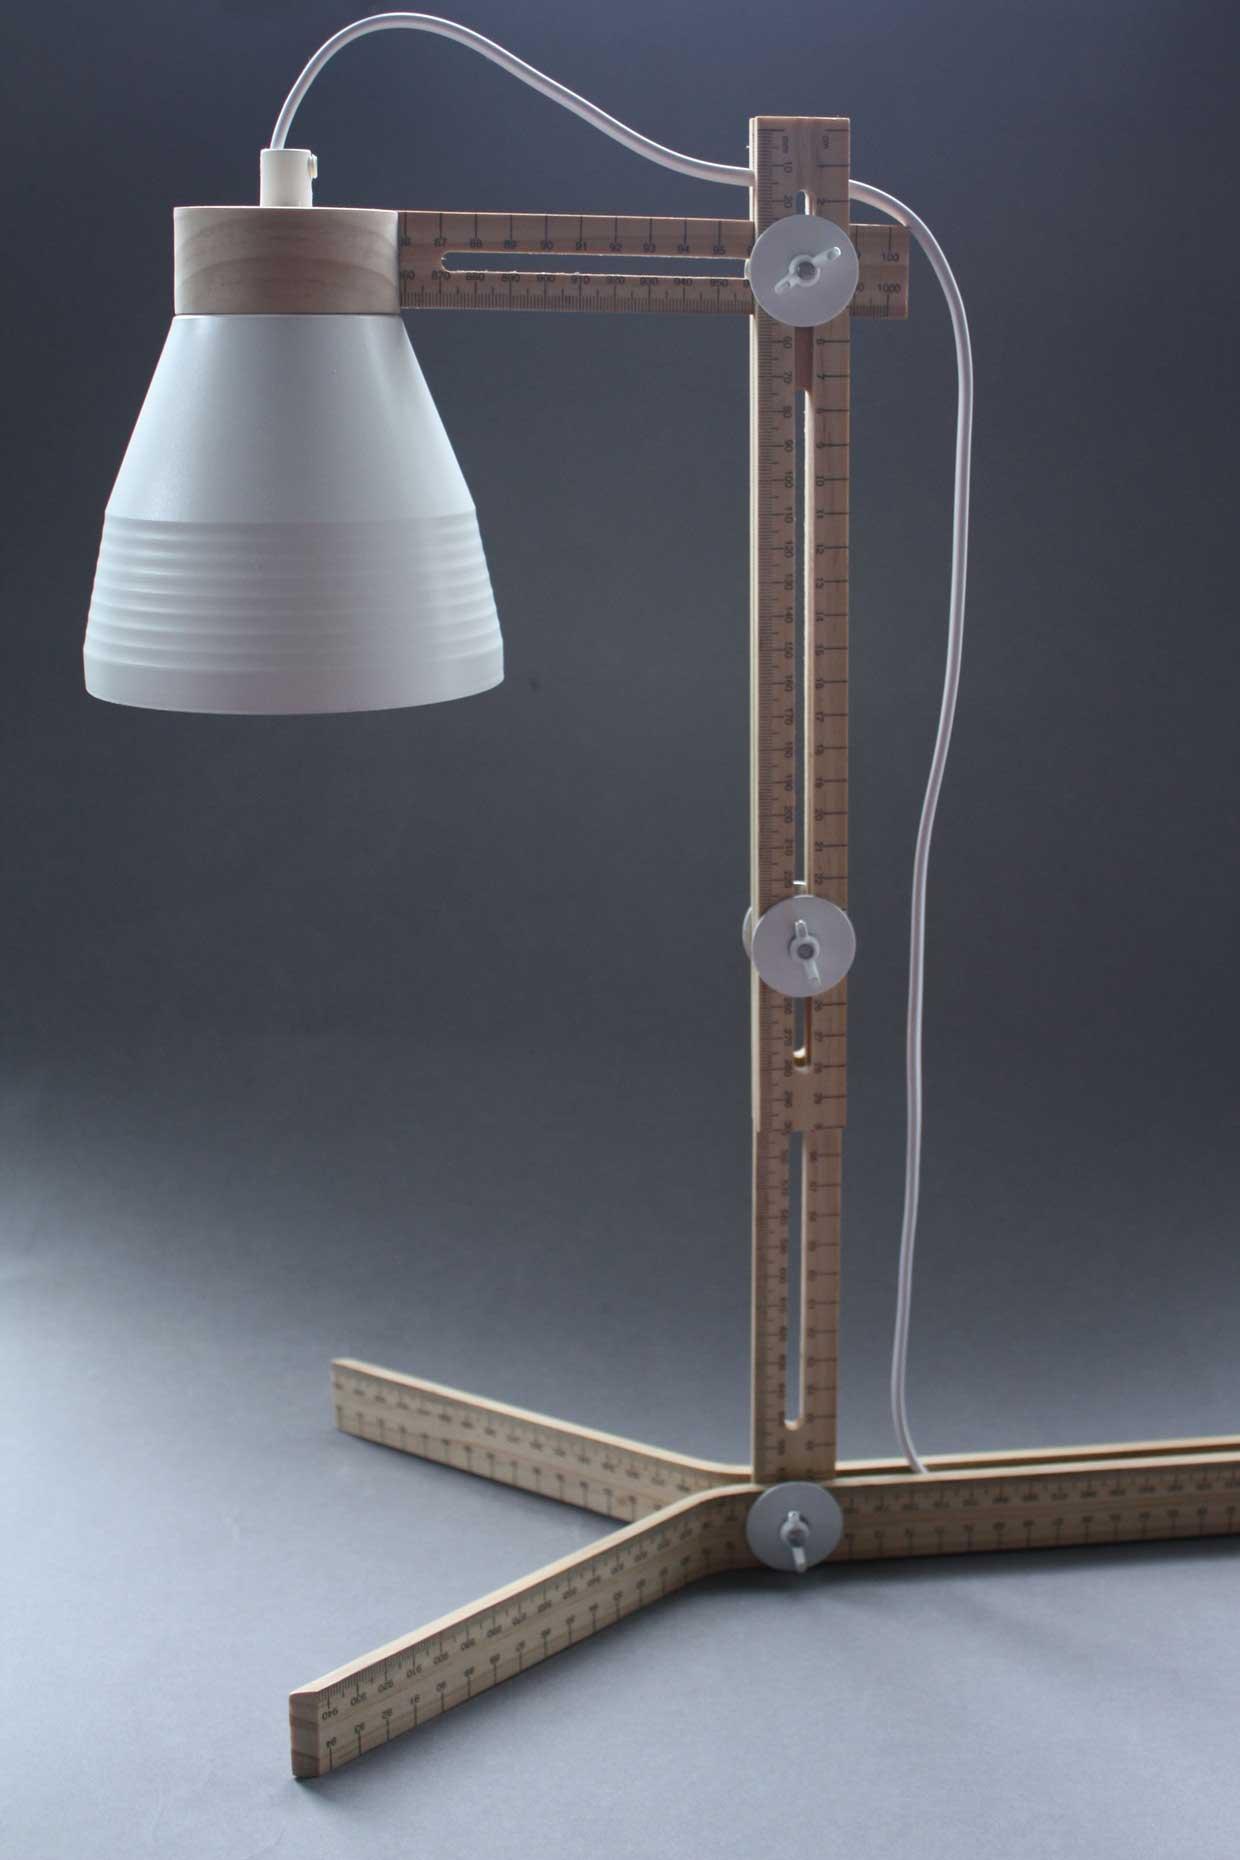 Made To Measure Table Lamp By Nikolai Sorensen